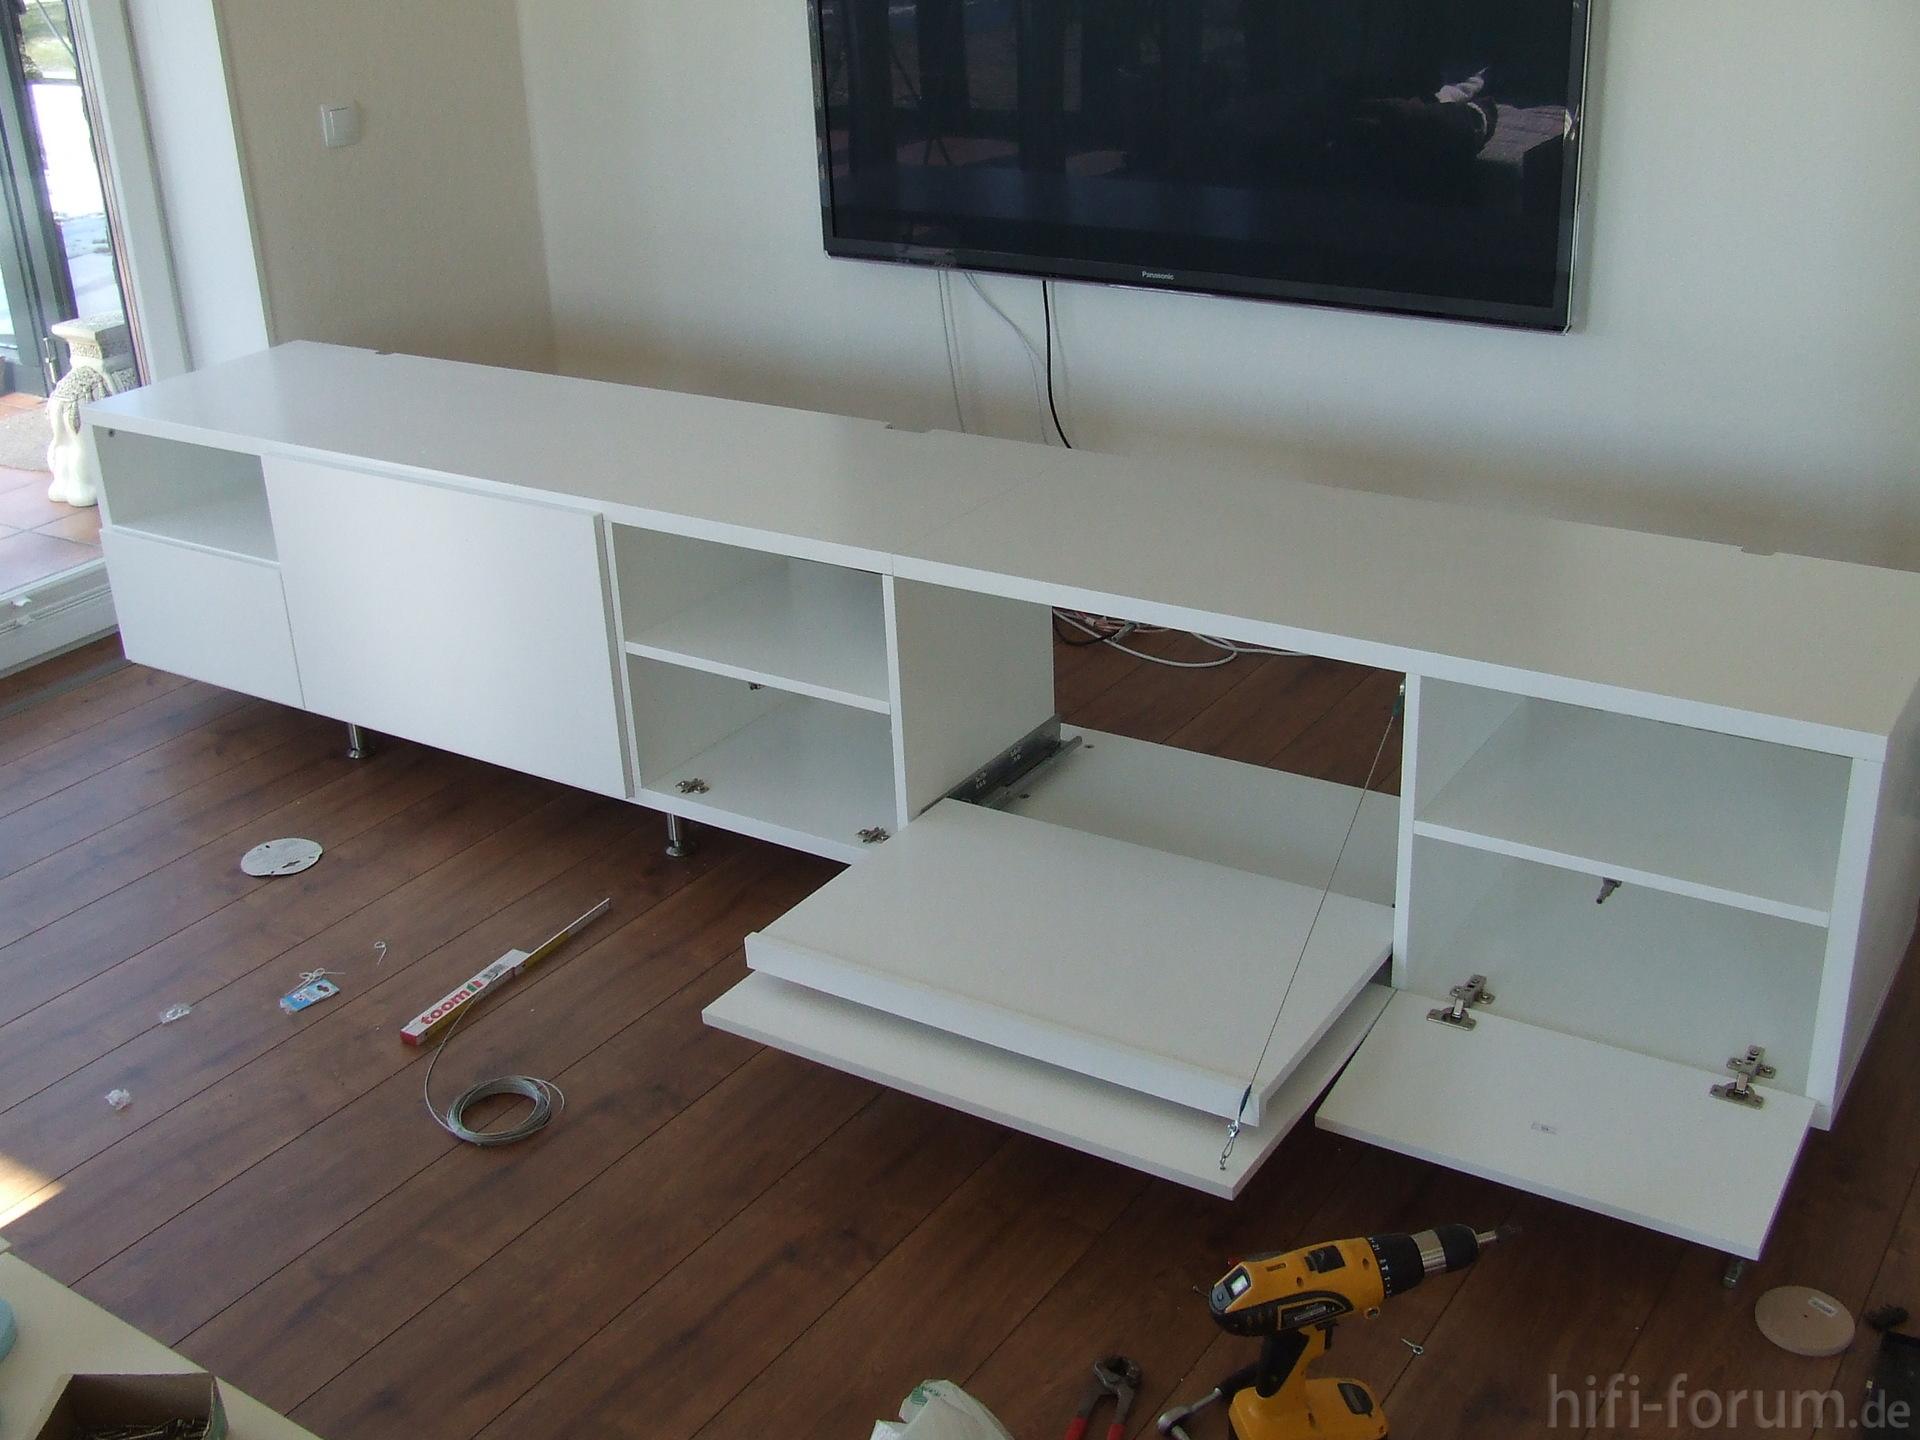 lowboard nach dem aufbau aufbau lowboard lowboardmassivkonzept hifi bildergalerie. Black Bedroom Furniture Sets. Home Design Ideas